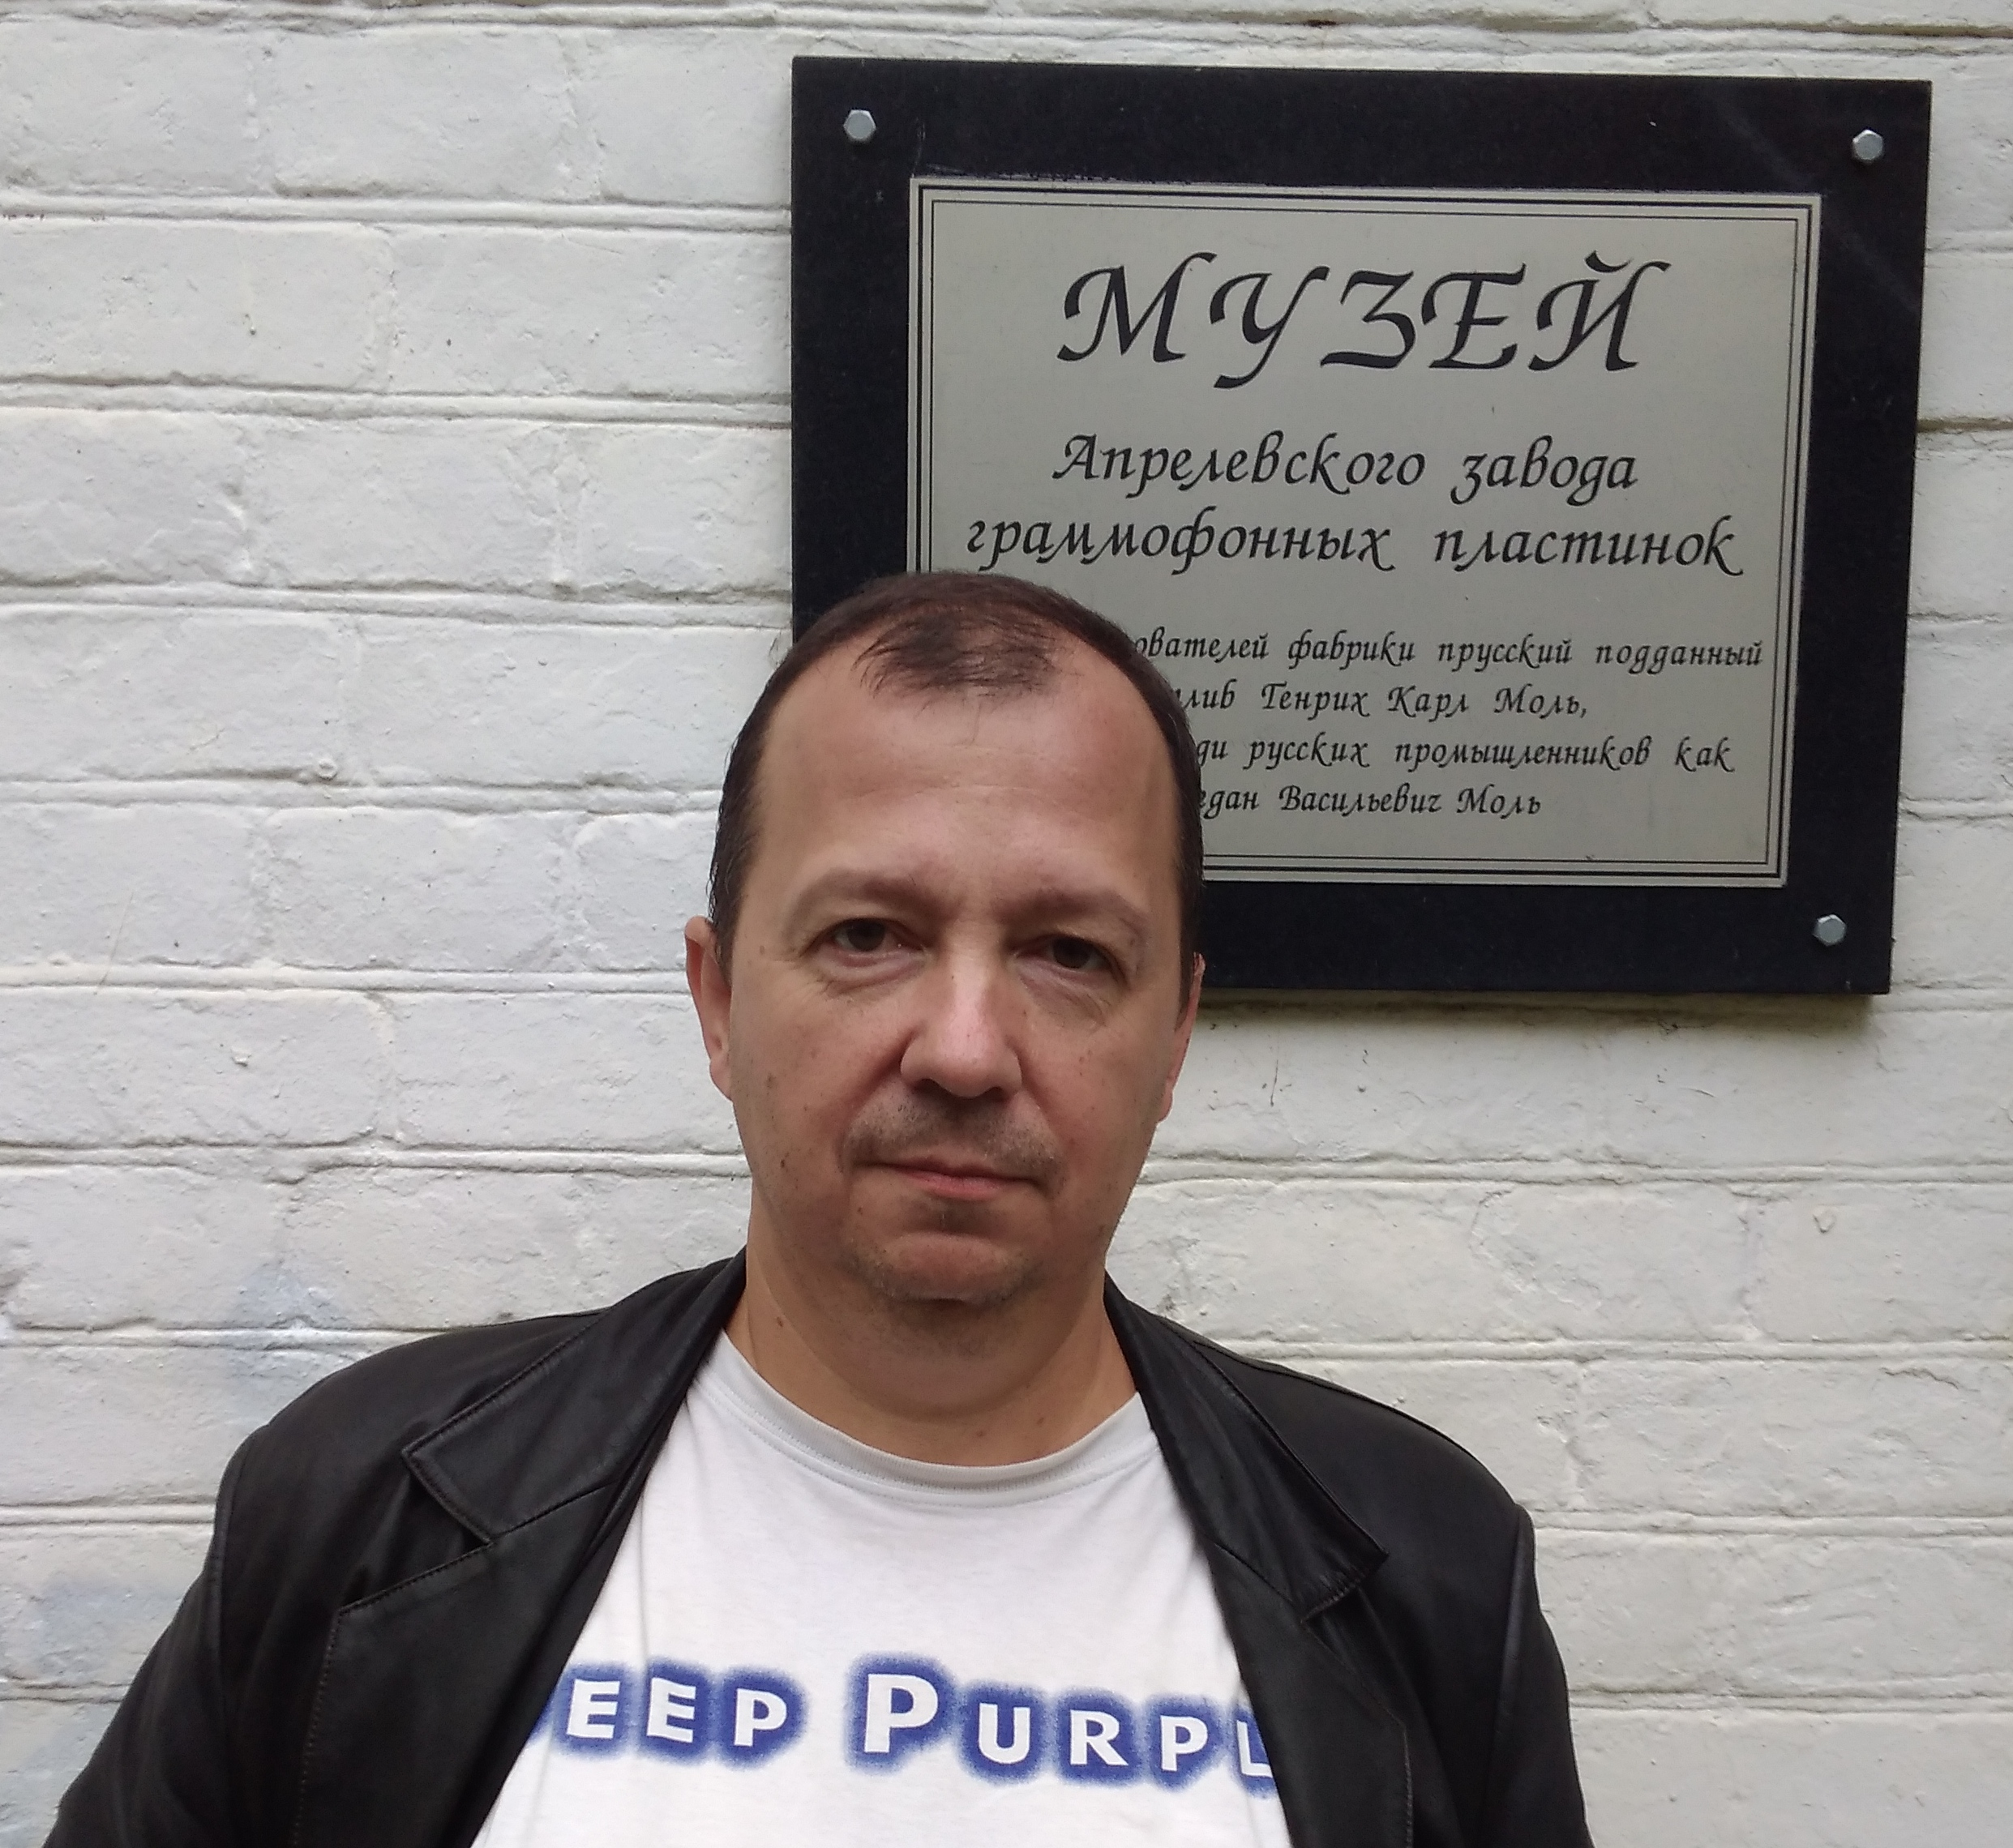 Синєокий Олег Володимирович